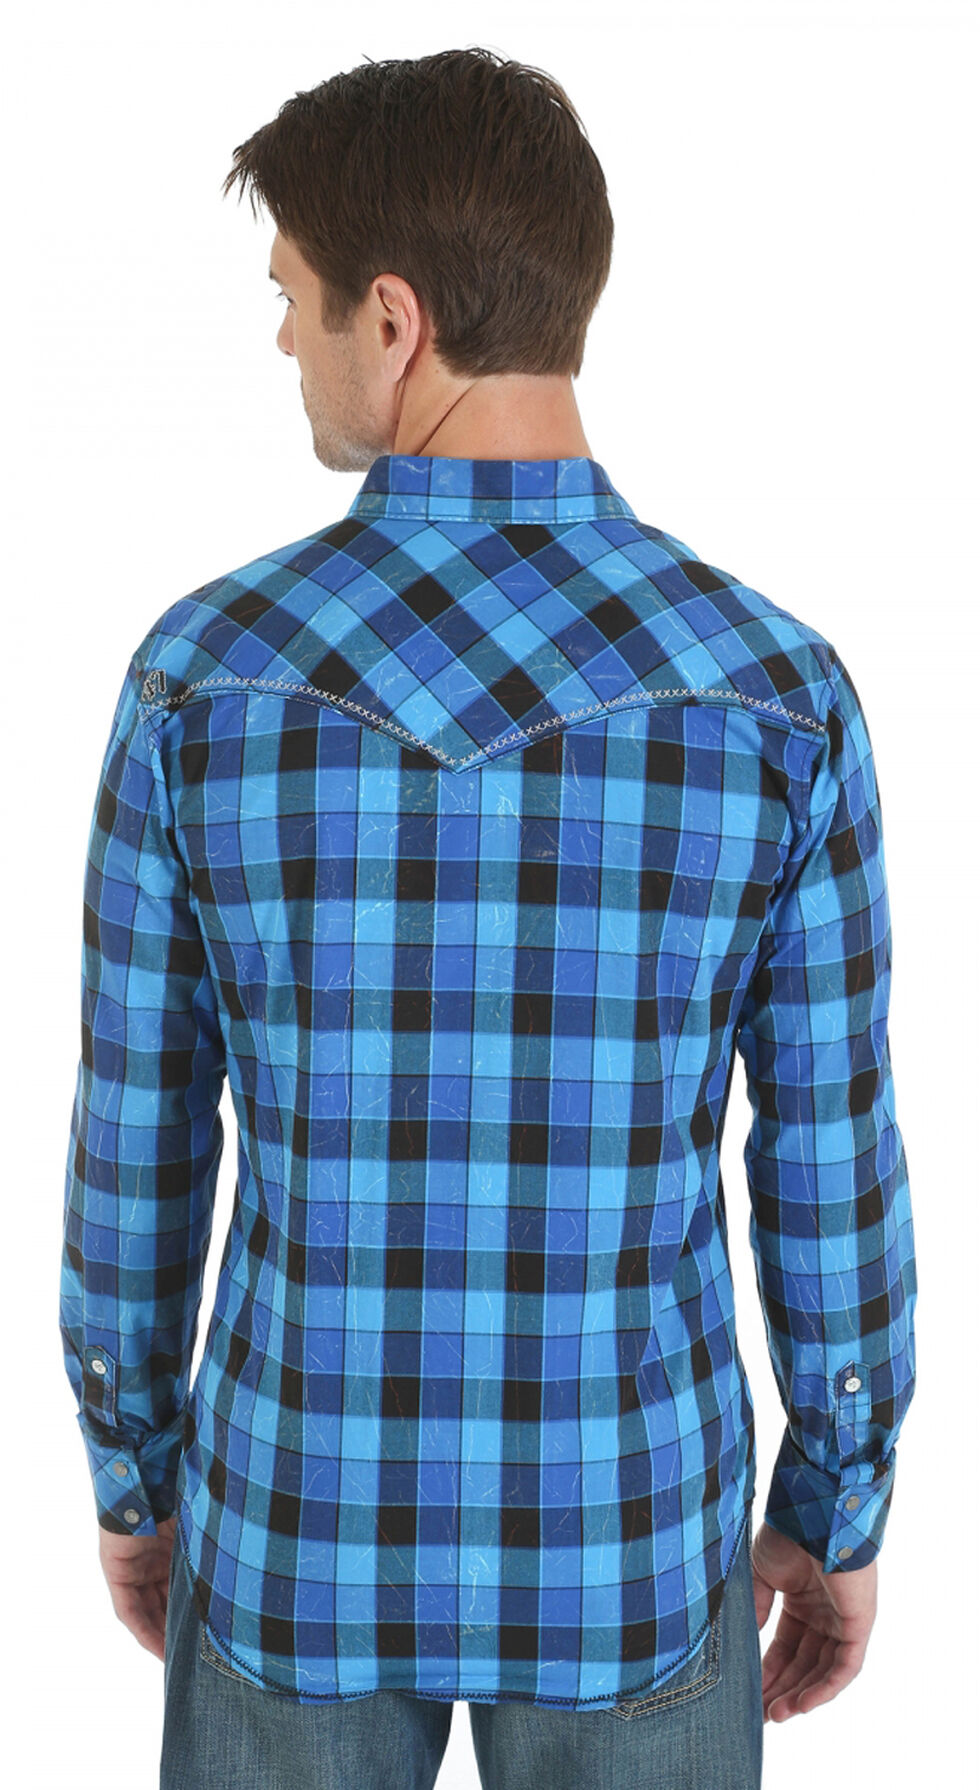 Wrangler Rock 47 Embroidered Blue and Black Plaid Long Sleeve Shirt, Blue, hi-res